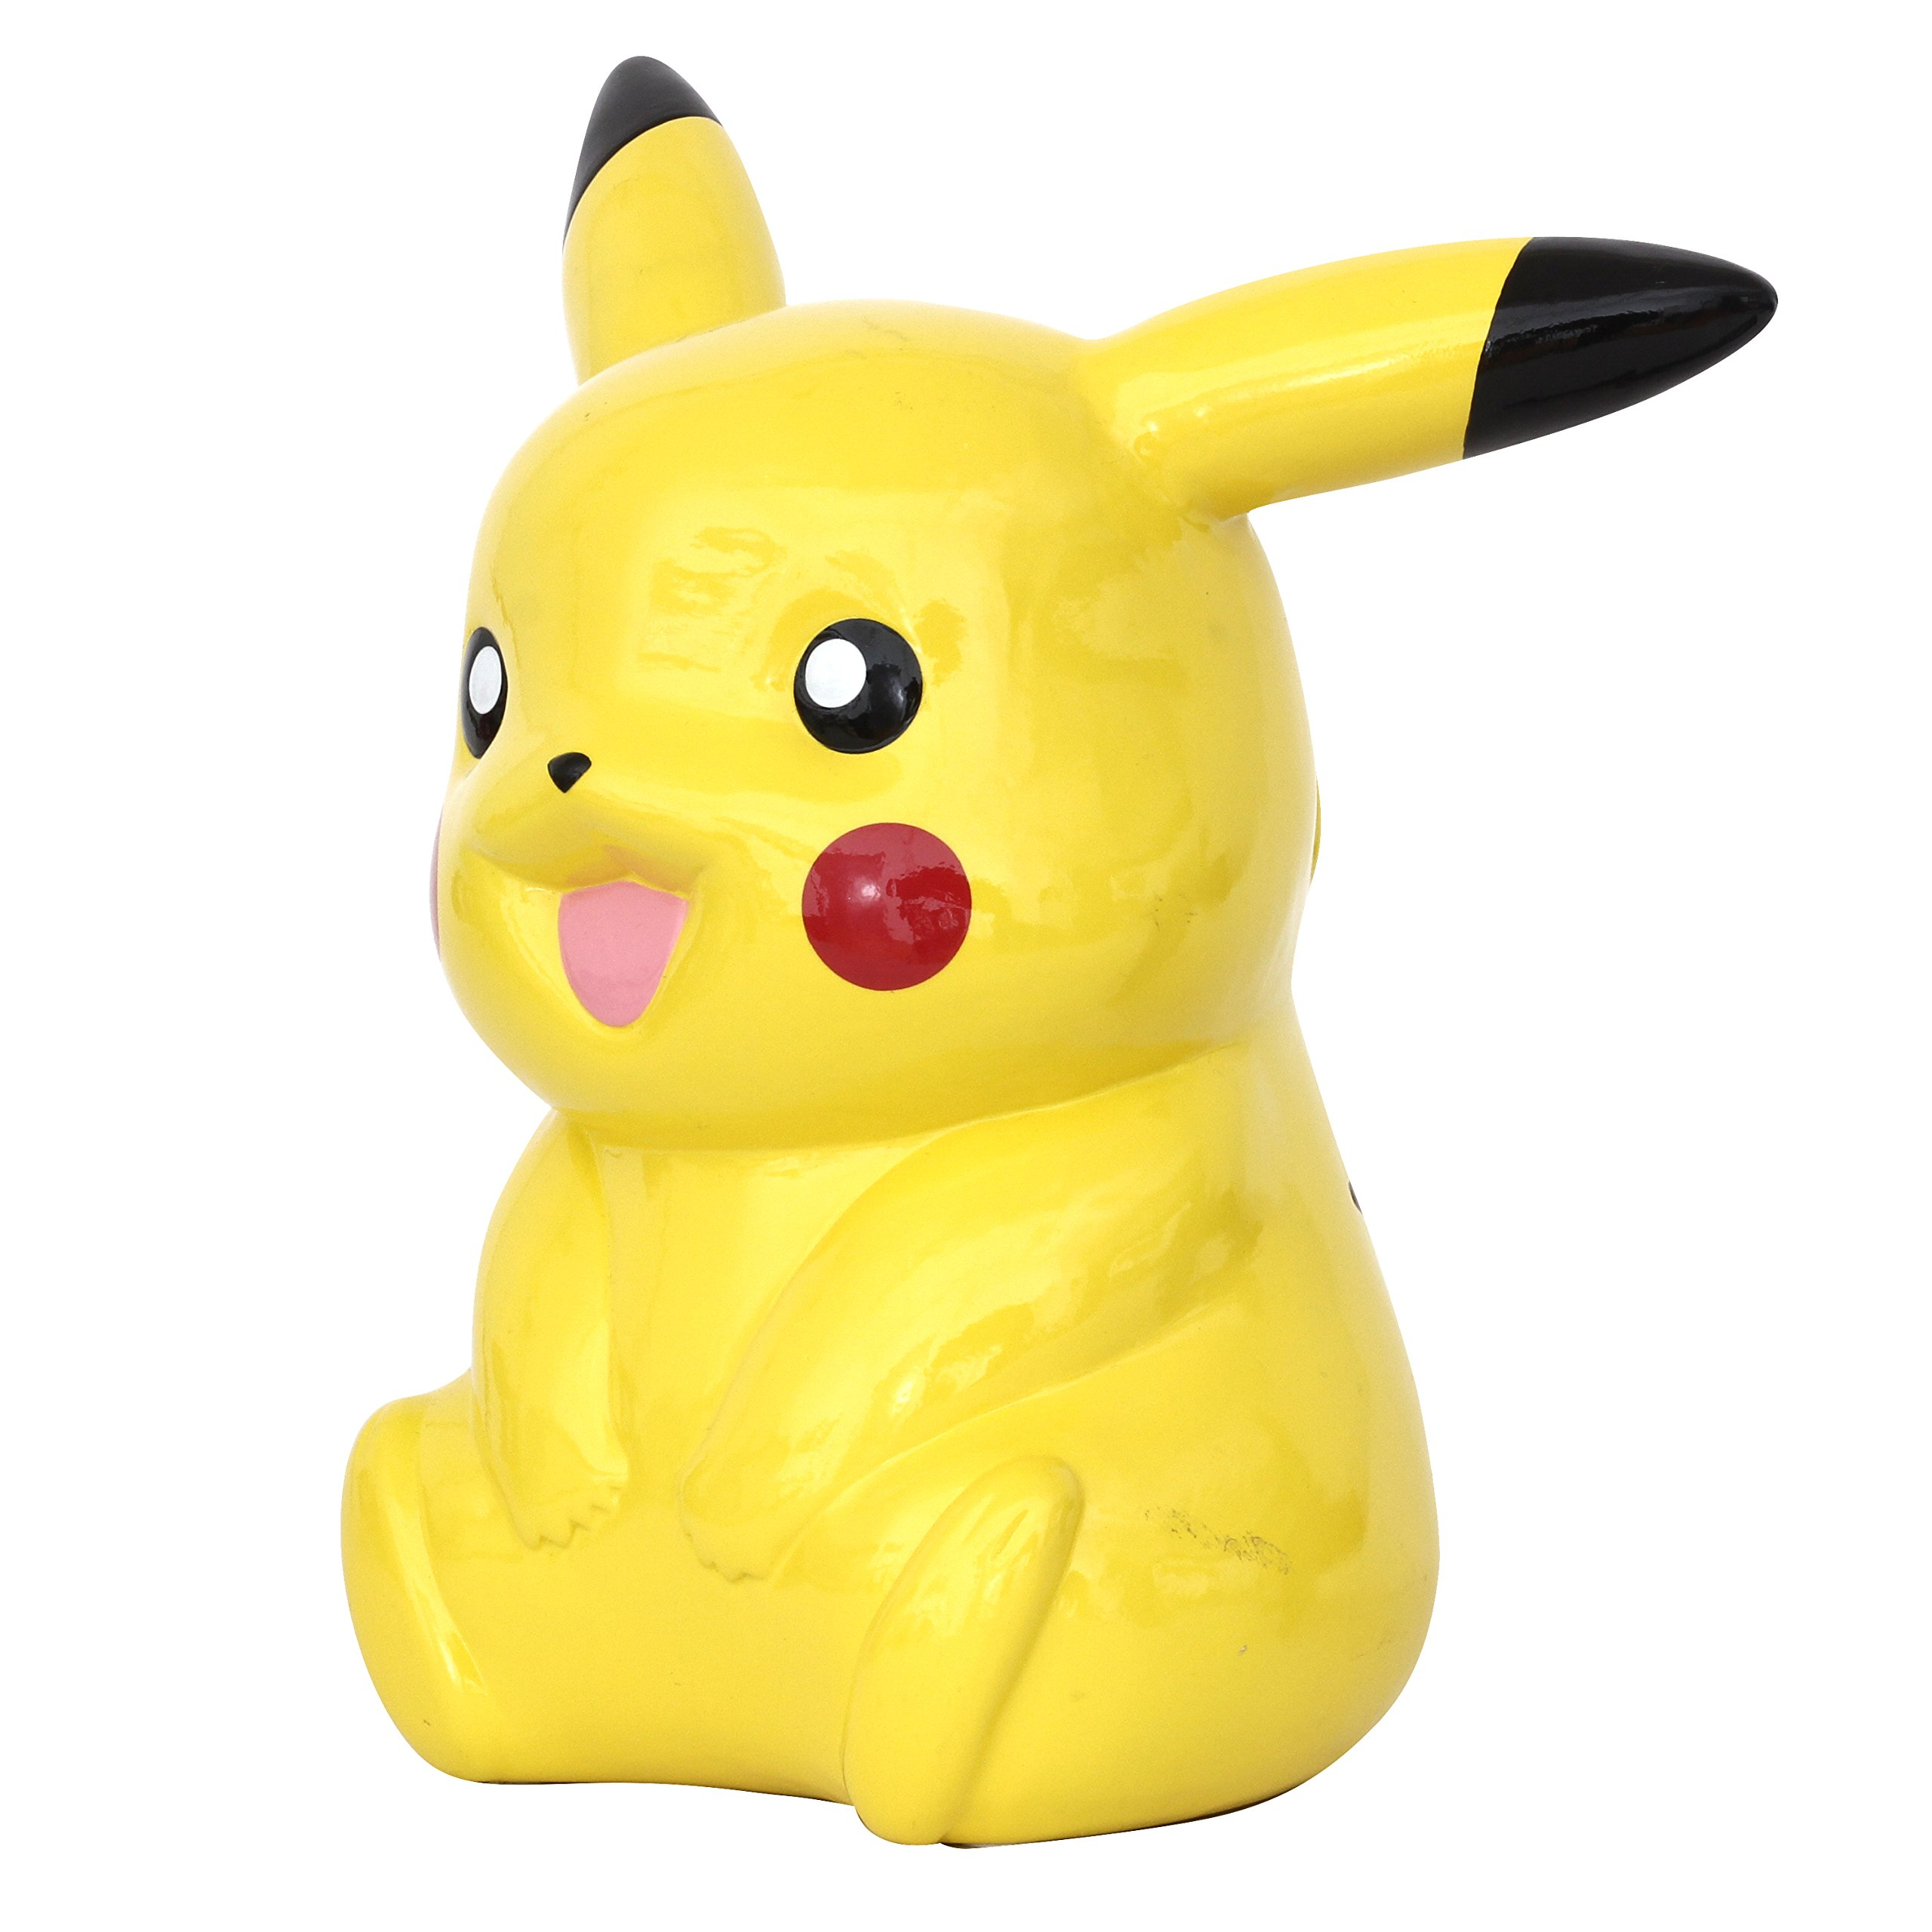 Fab Star Kid's Pikachu Bank, Yellow by Pokémon (Image #3)